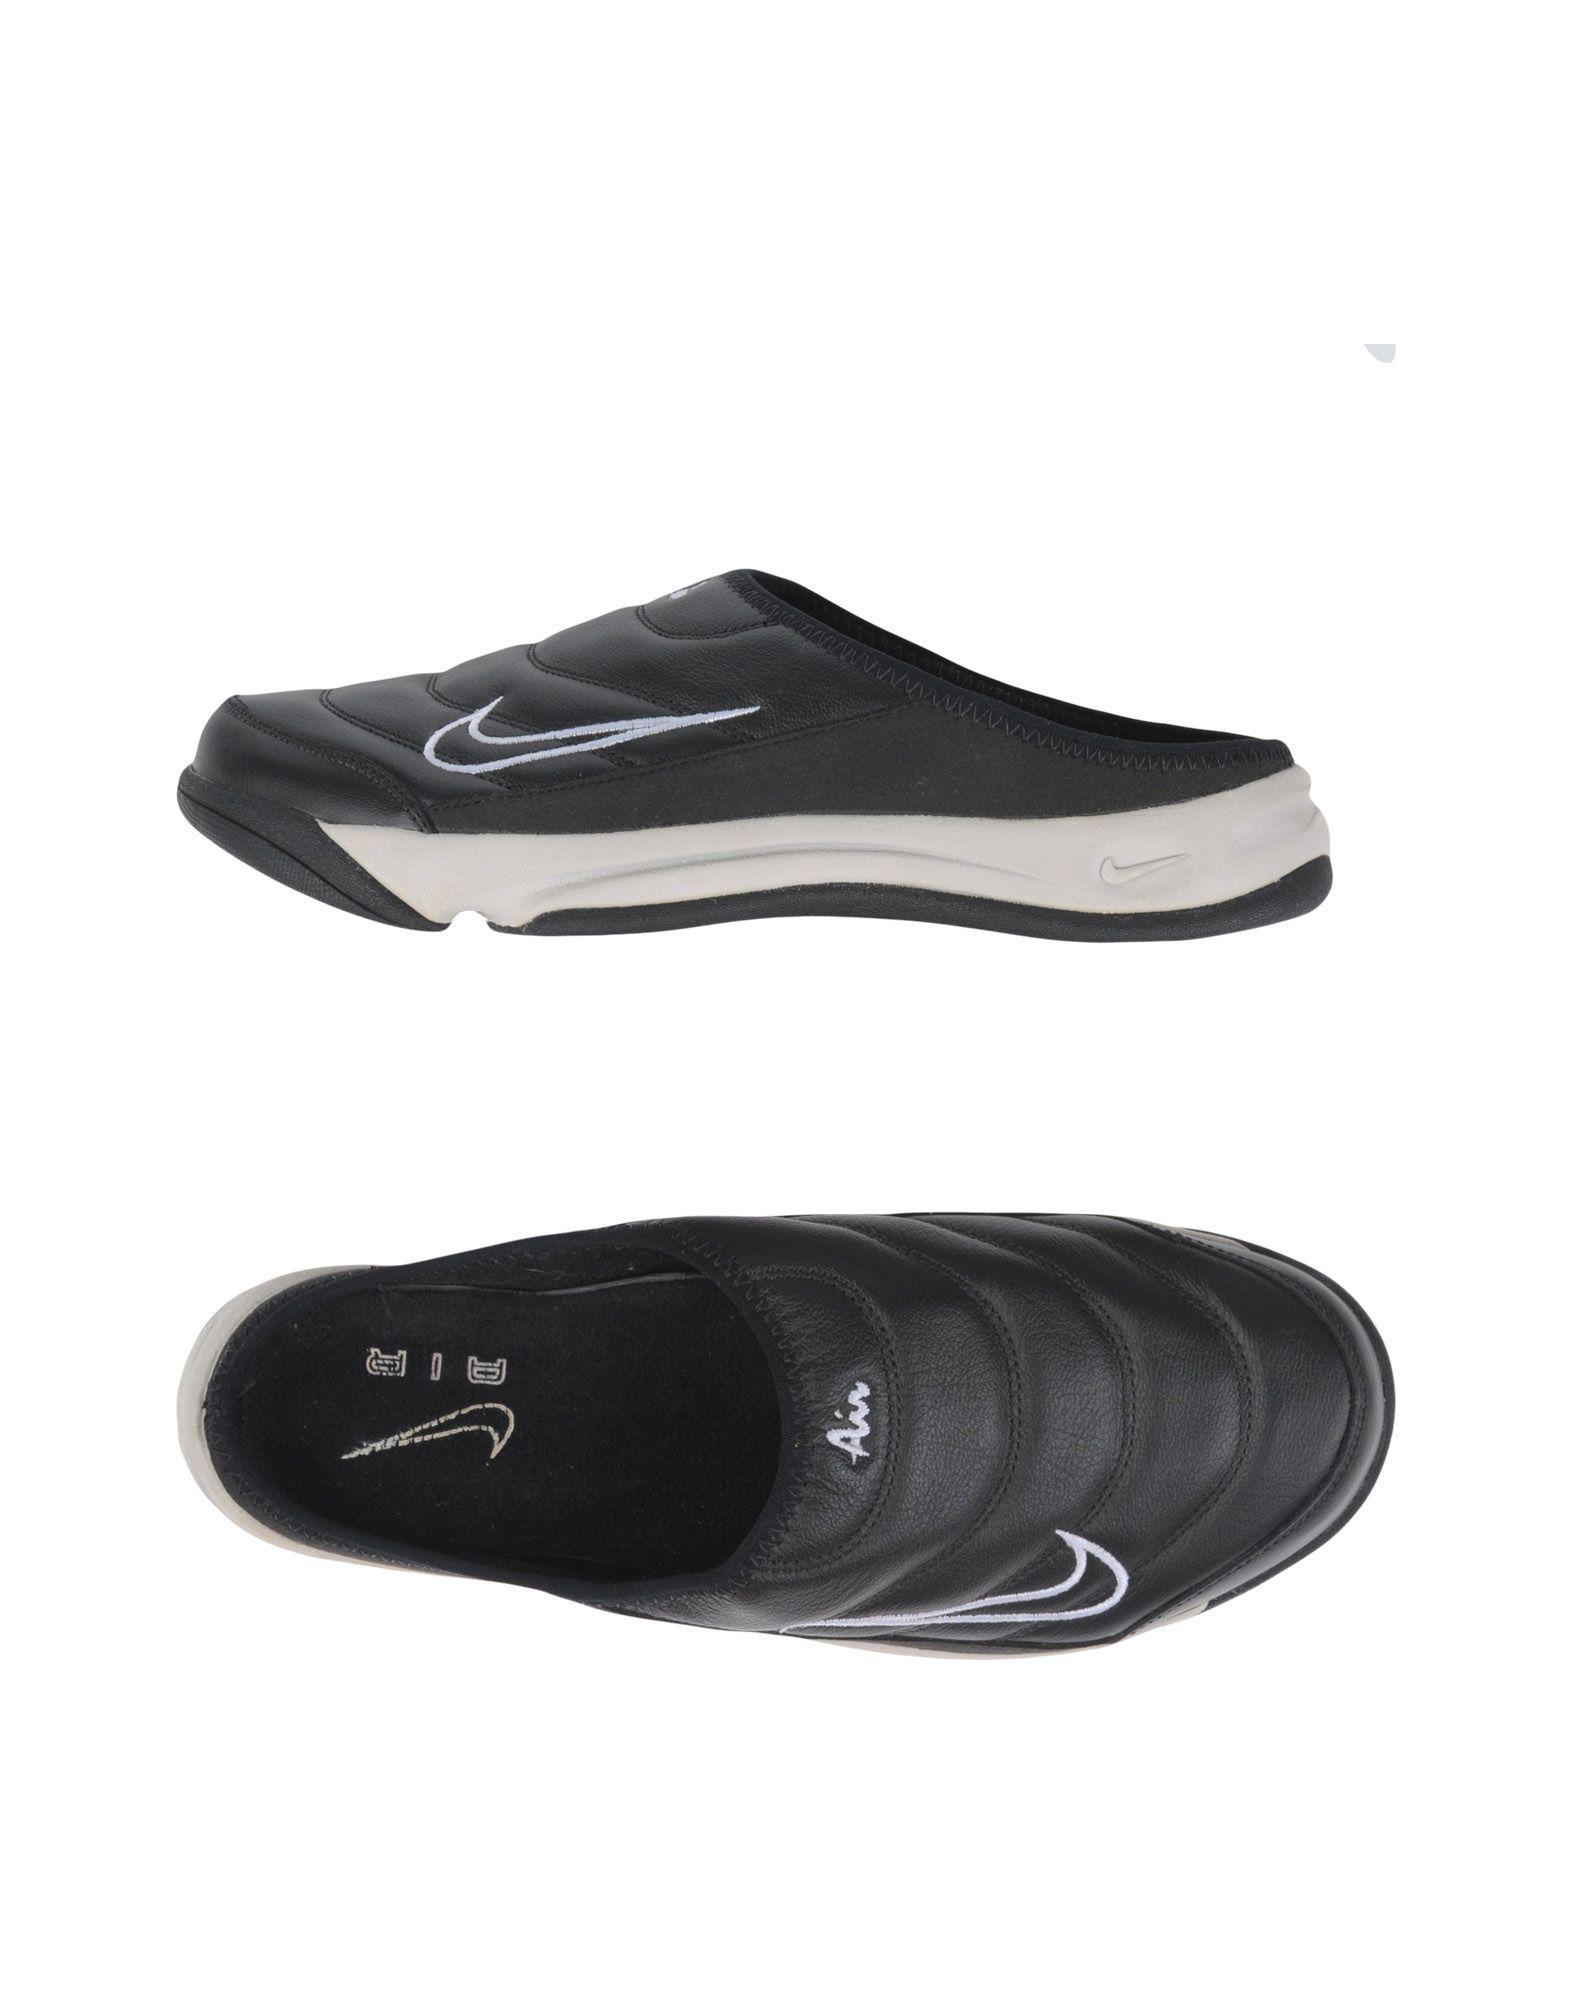 Nike Rubber Mules in Black for Men - Lyst